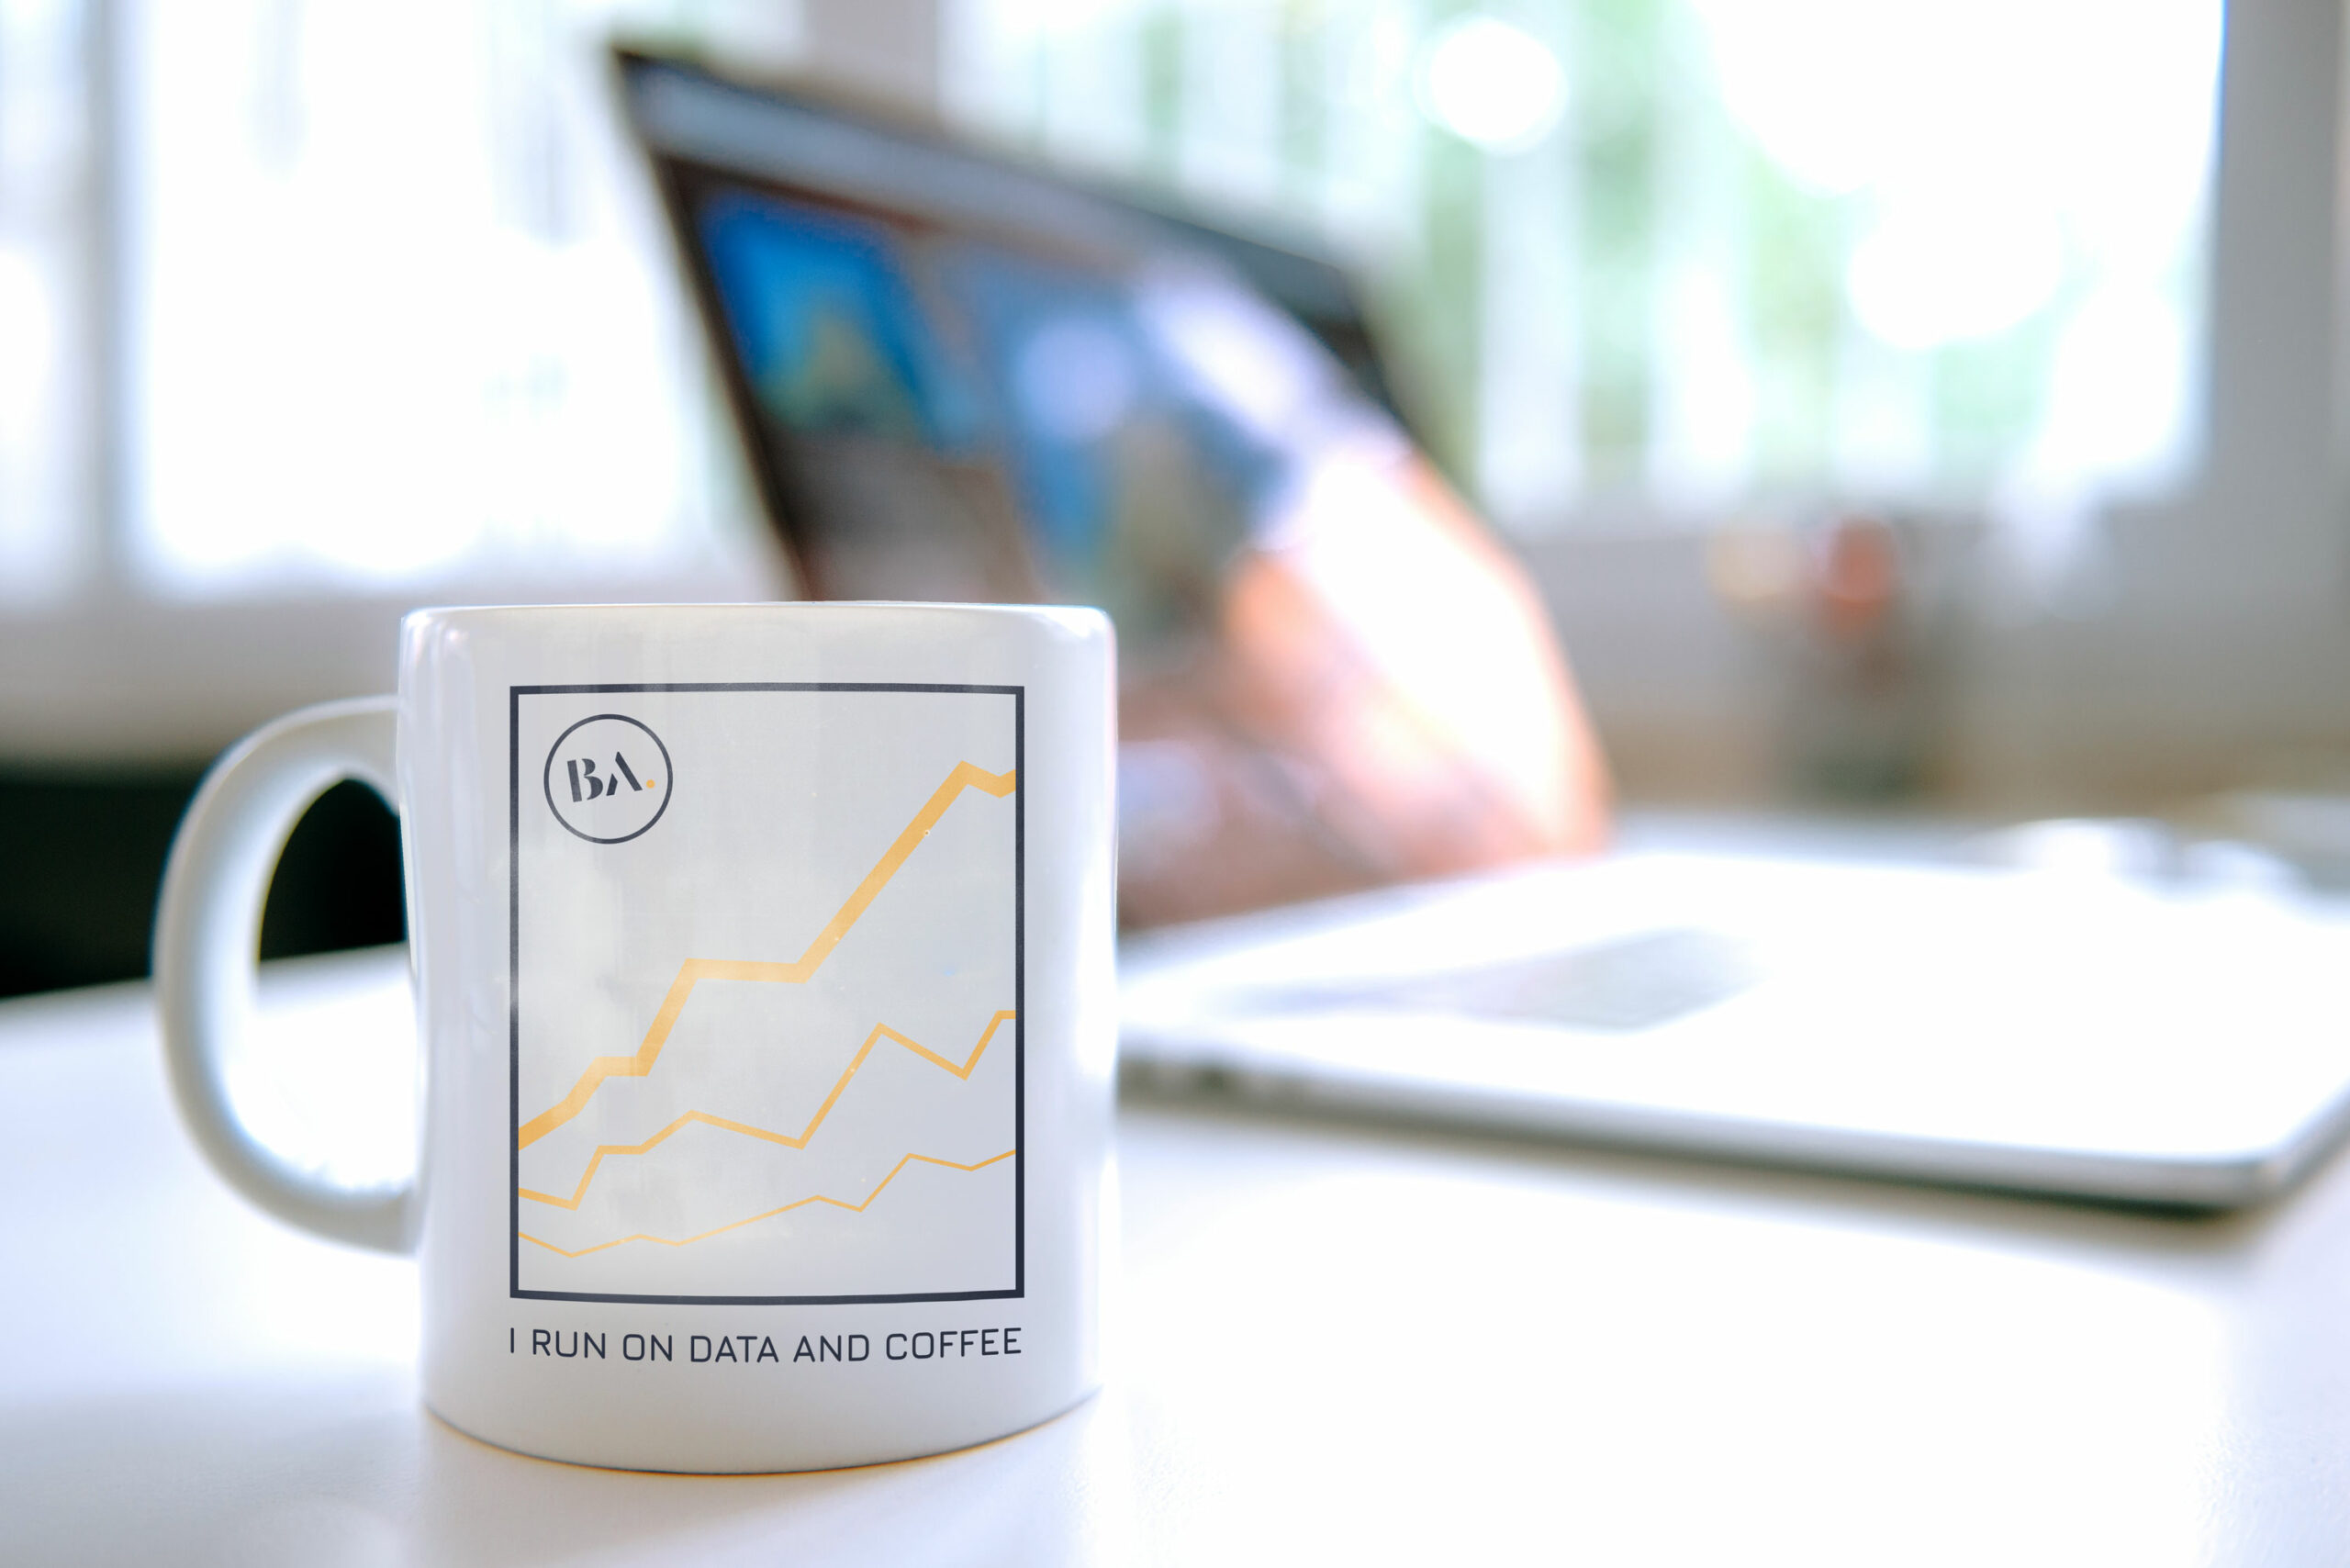 BA_CoffeeCup-NationalCoffeeDay-LinkedIn-scaled